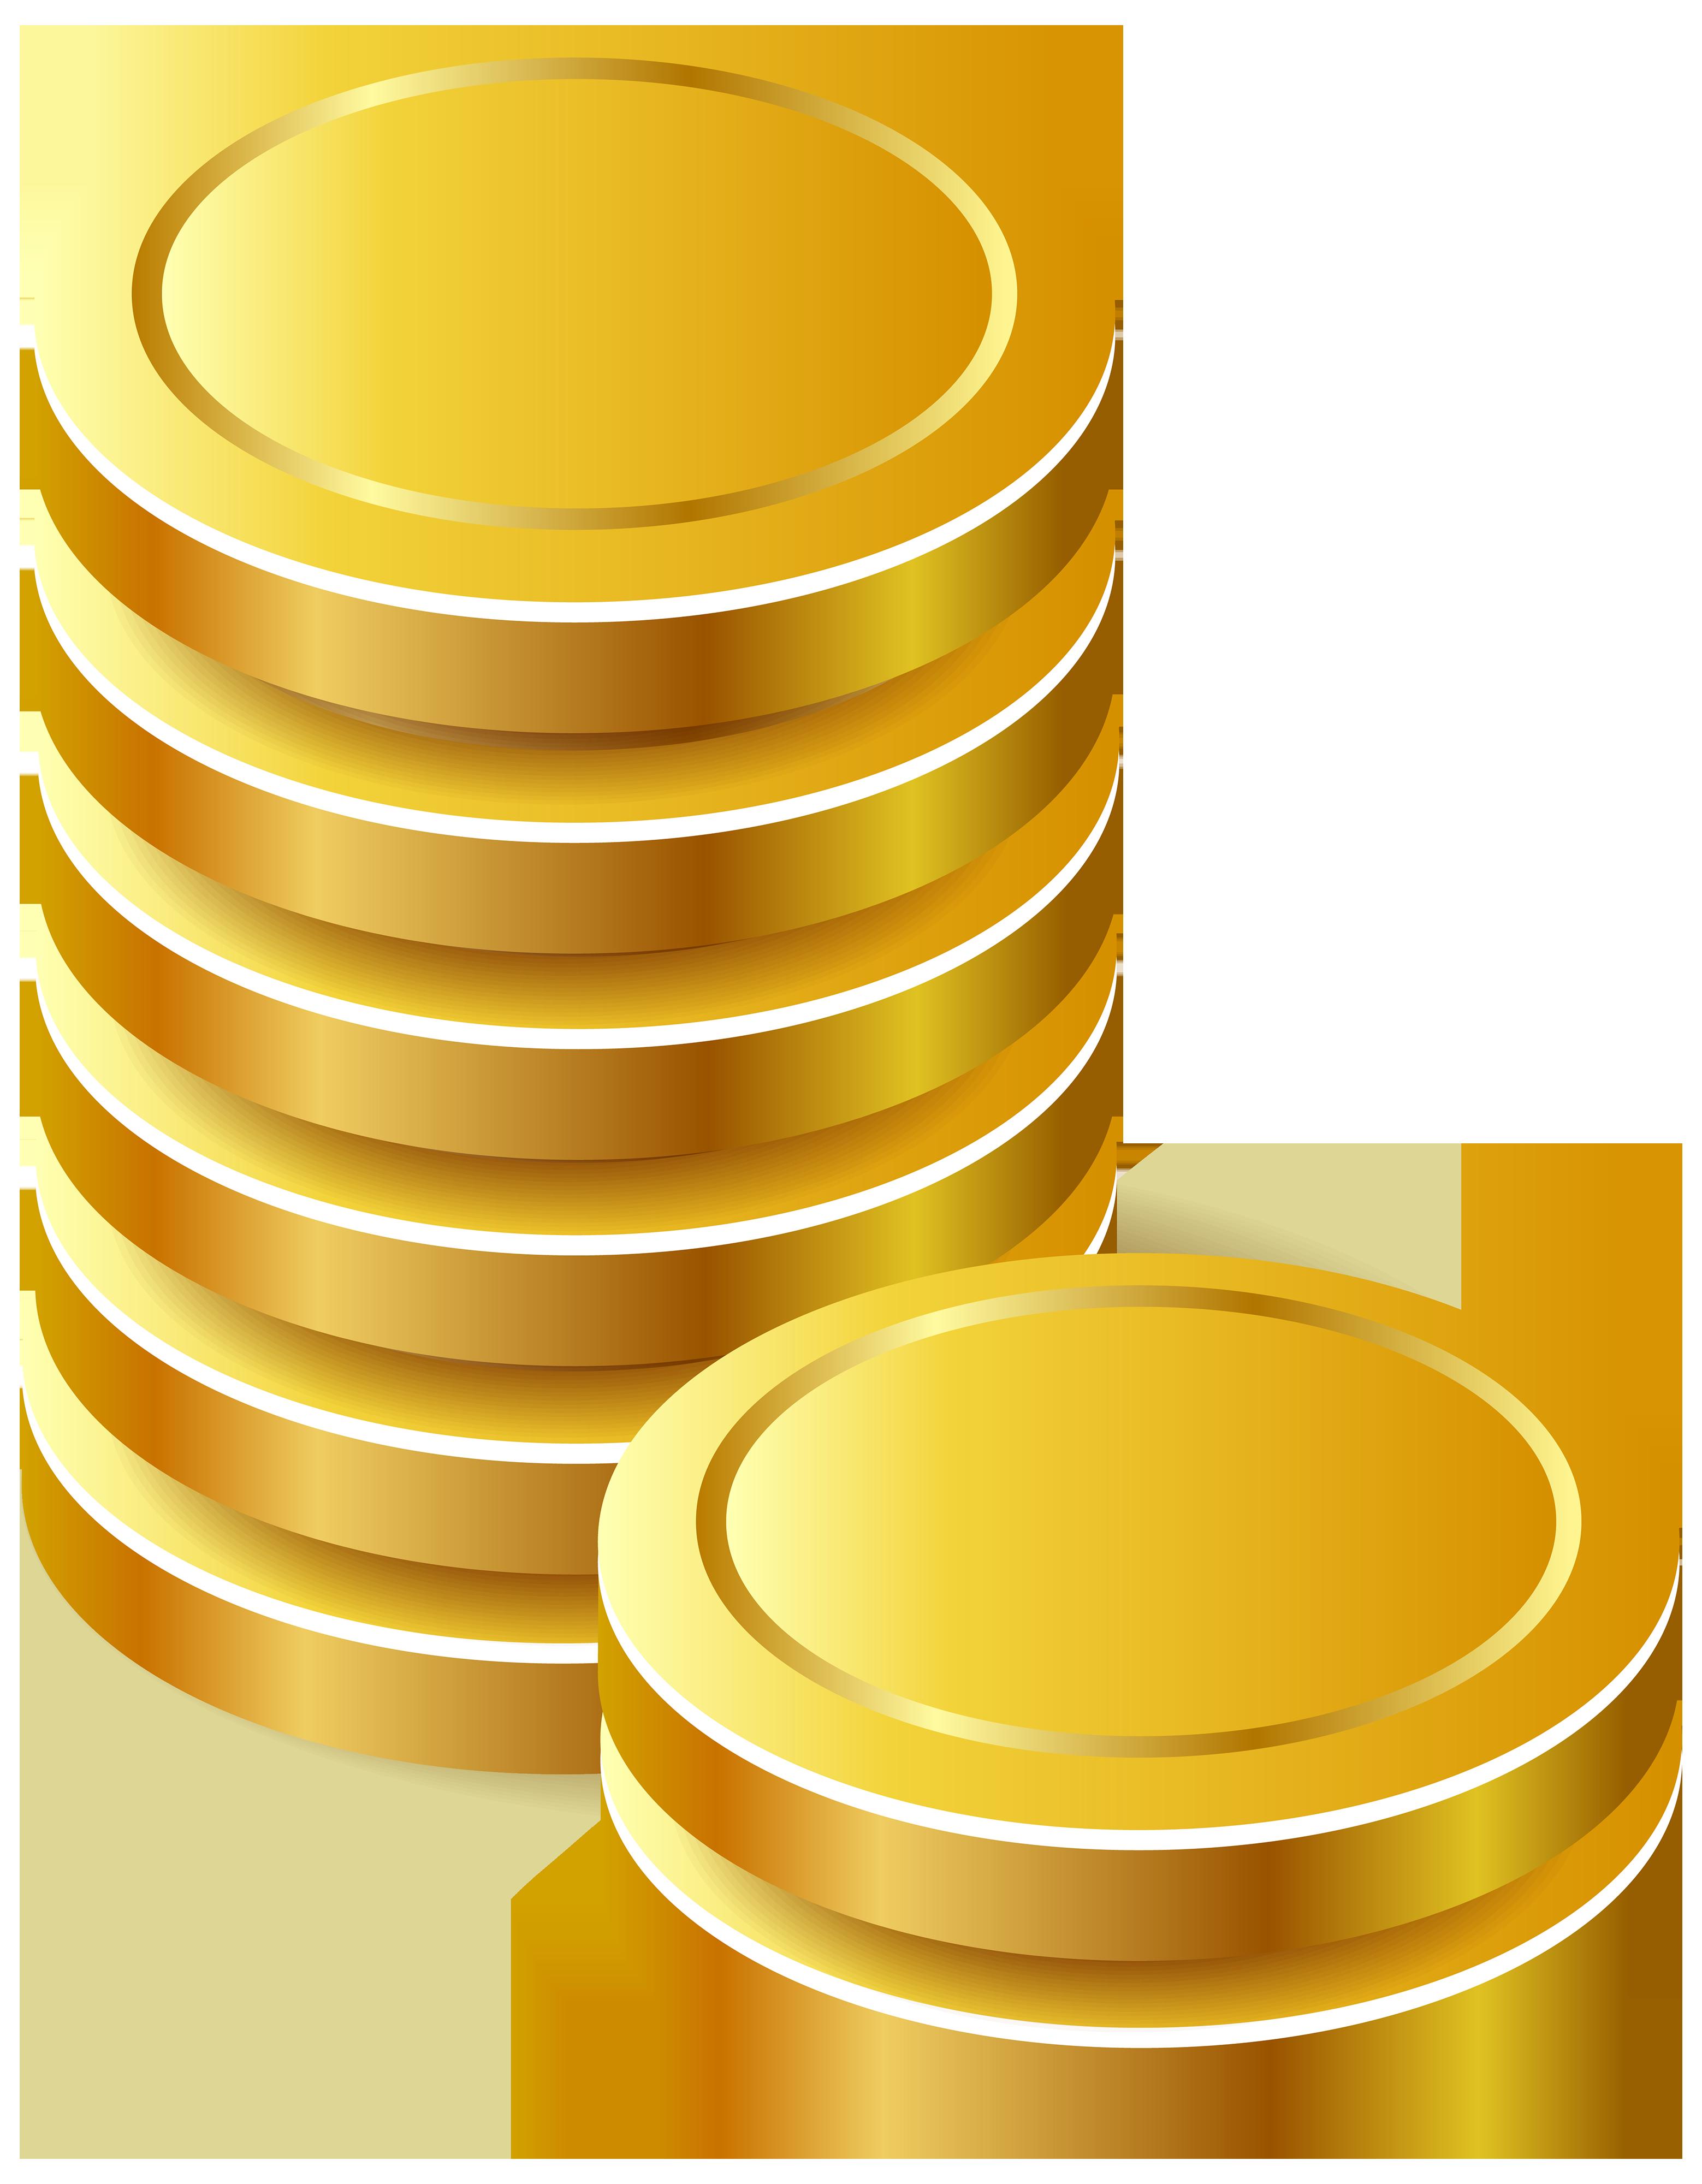 gold_bullion_coins_white_background_money_80253_1920x1080. Coin clipart png  - Coin PNG HD. gold_bullion_coins_white_background_money_80253_1920x1080. - Coins PNG HD